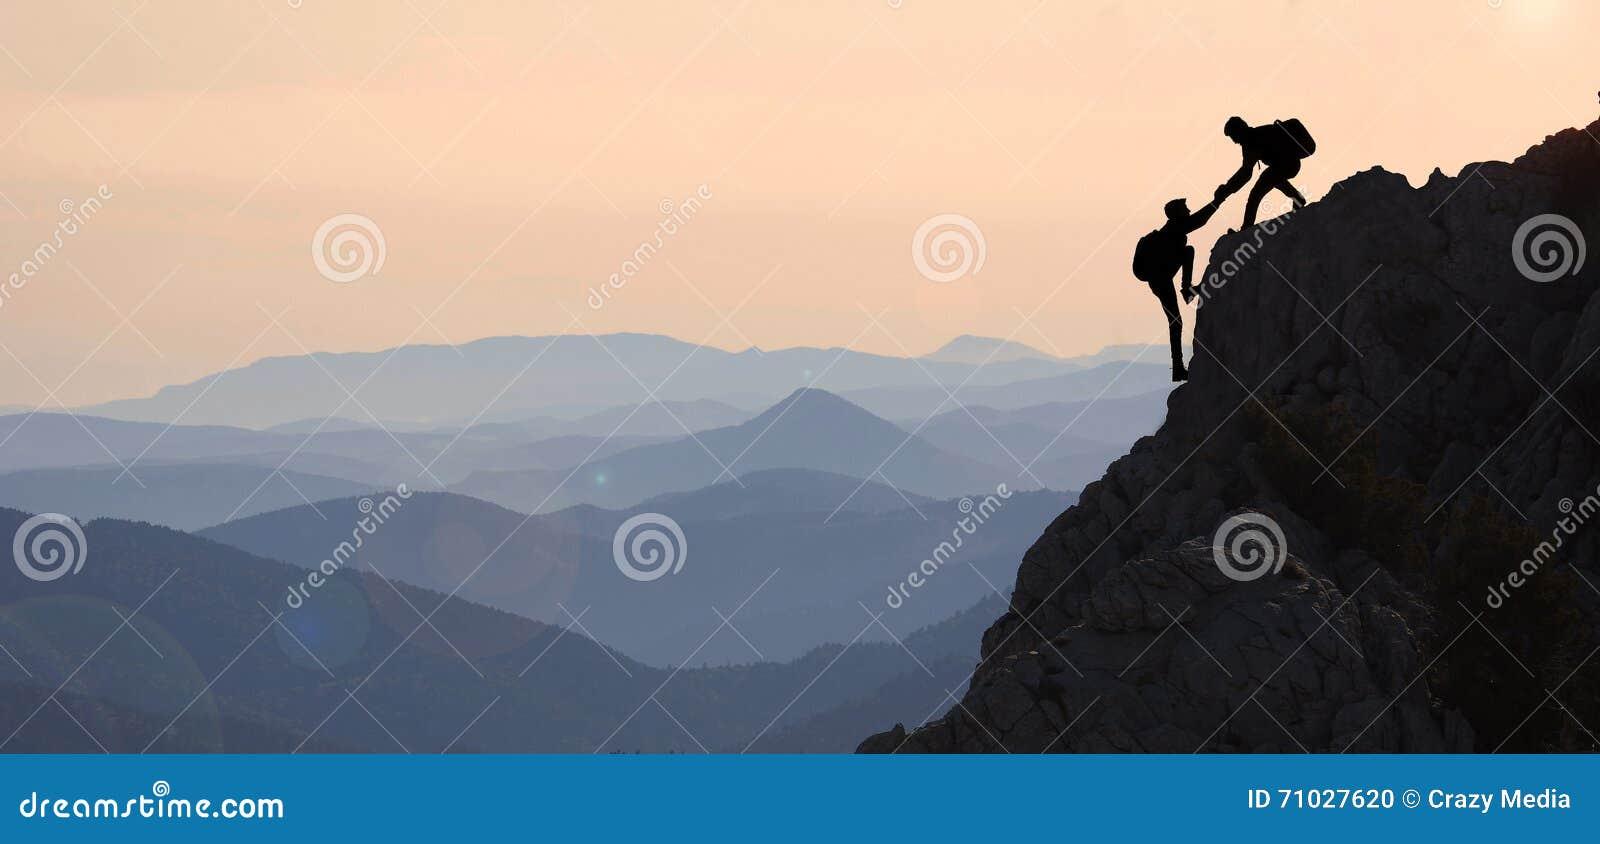 Help mountaineering & peak performance